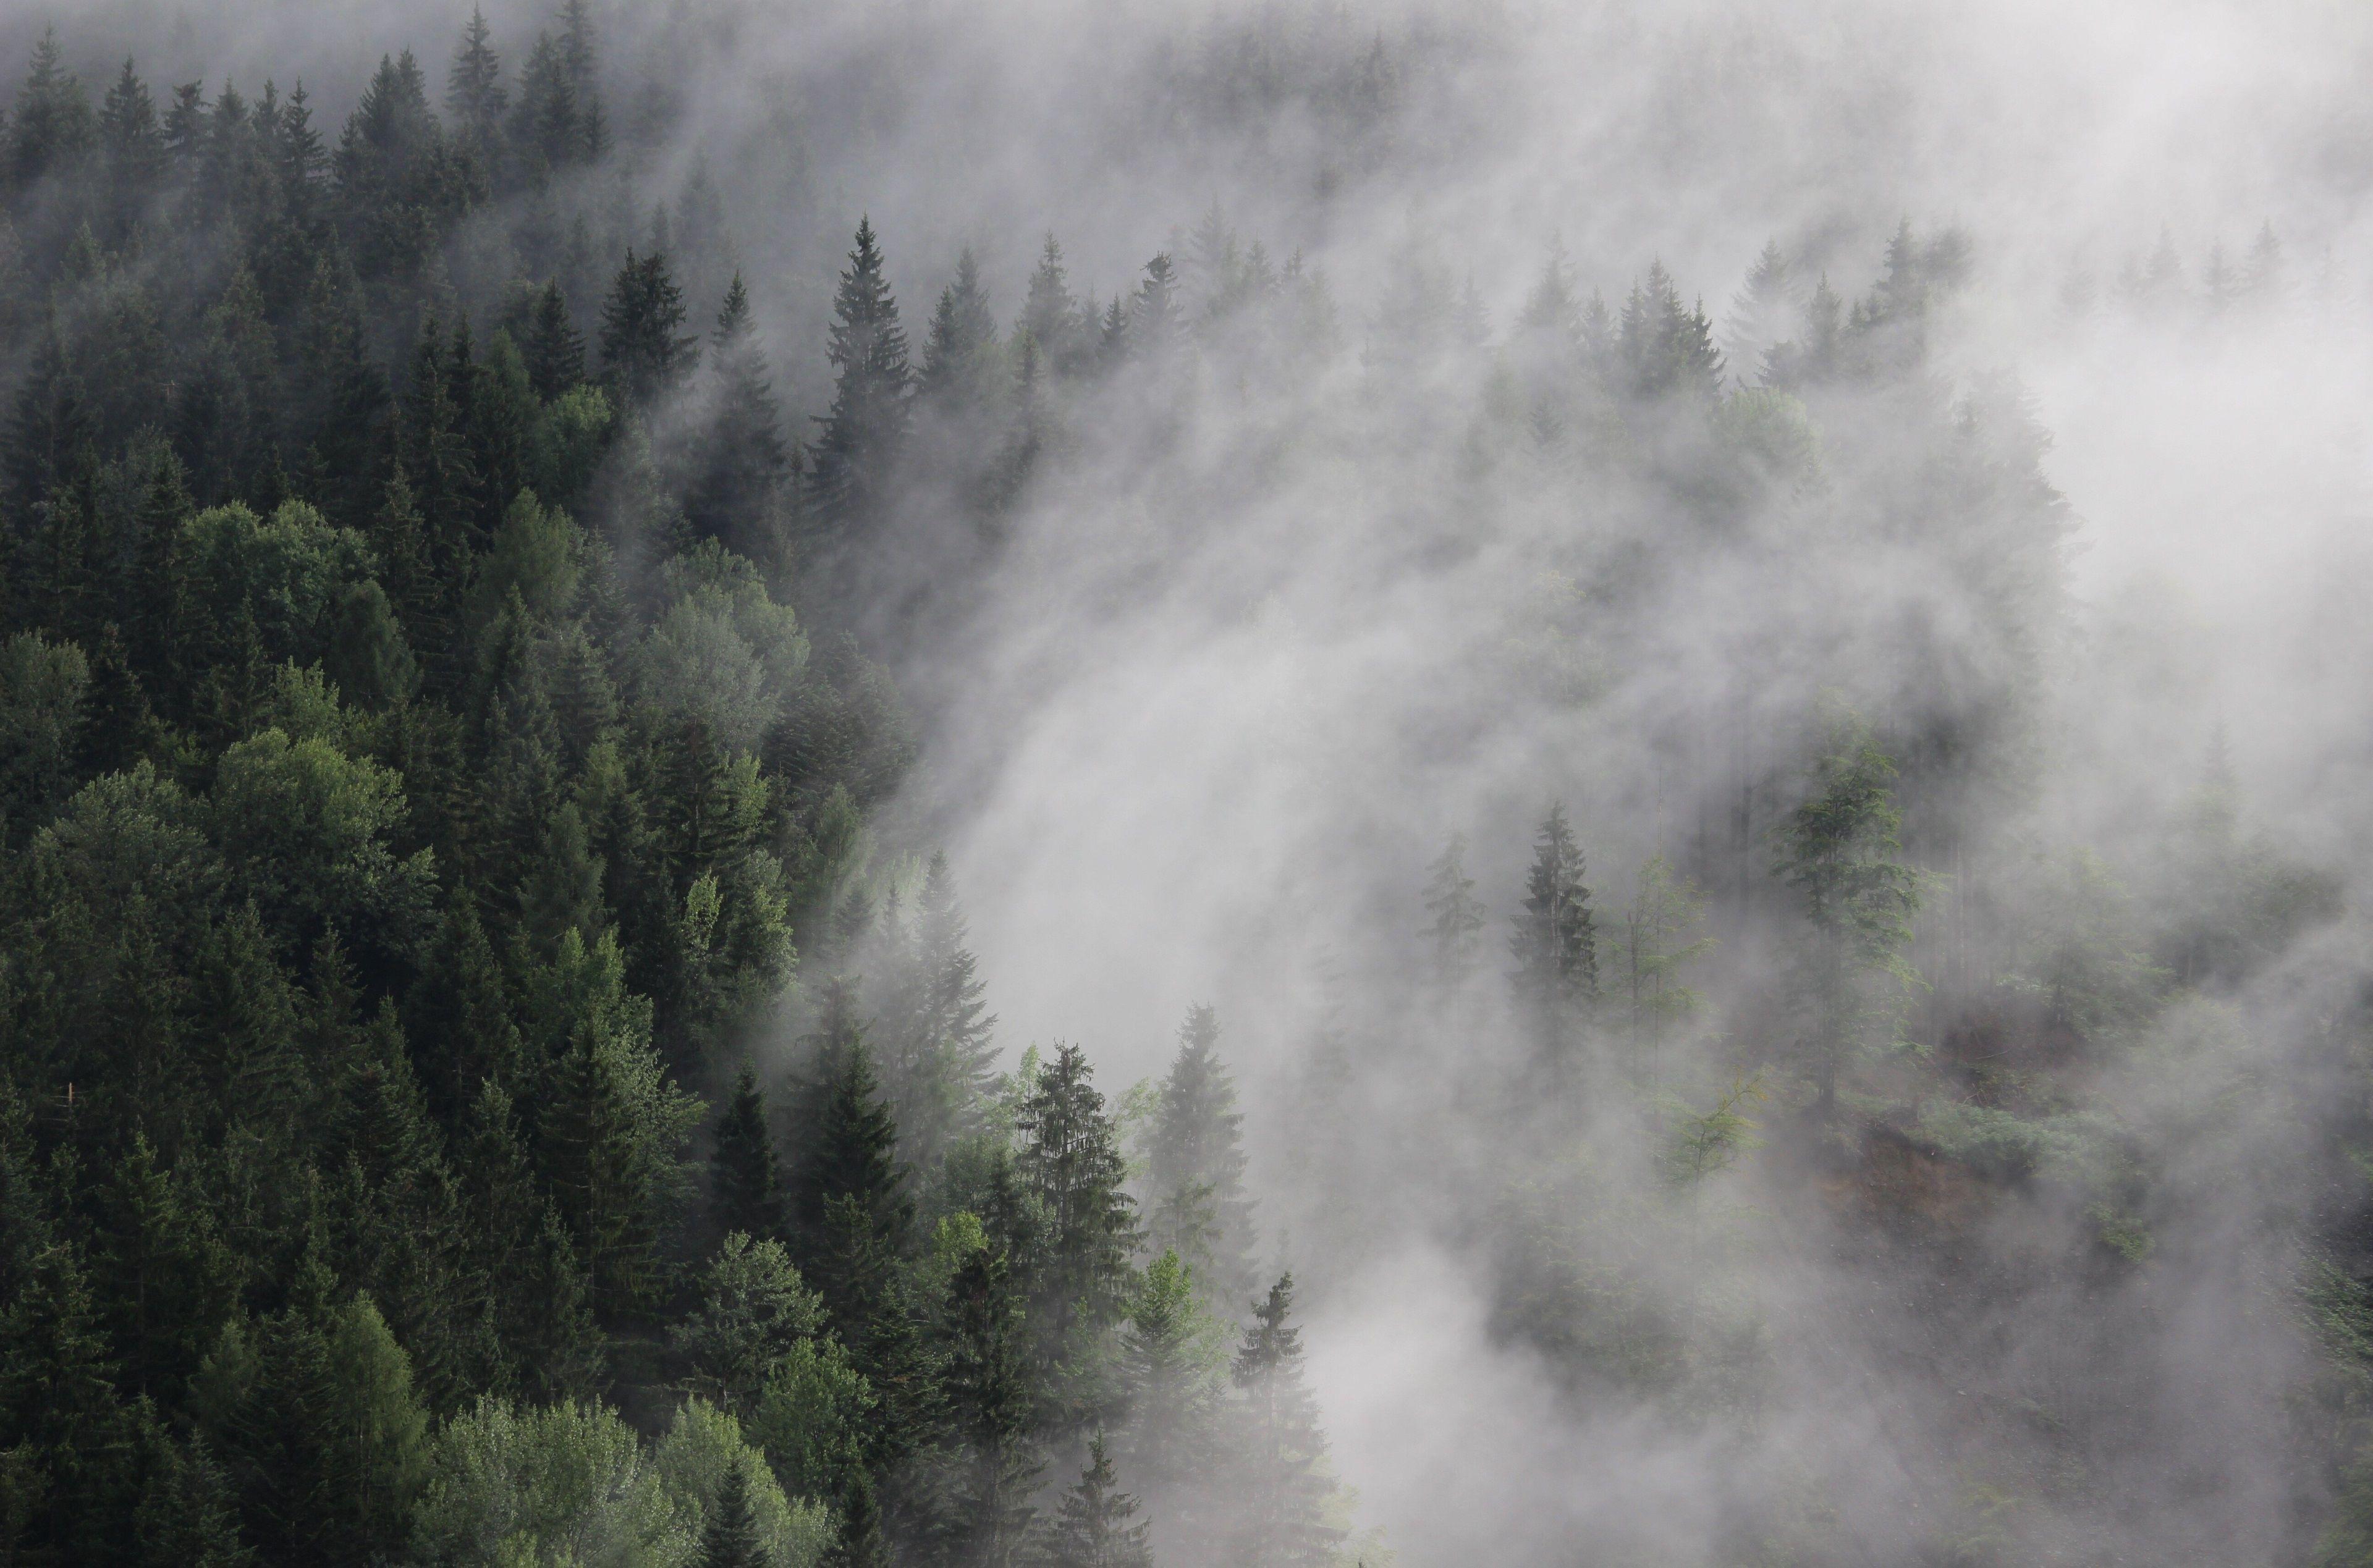 3840x2538 Austria 4k New Wallpaper Hd For Desktop Forest Wallpaper Foggy Forest New Wallpaper Hd